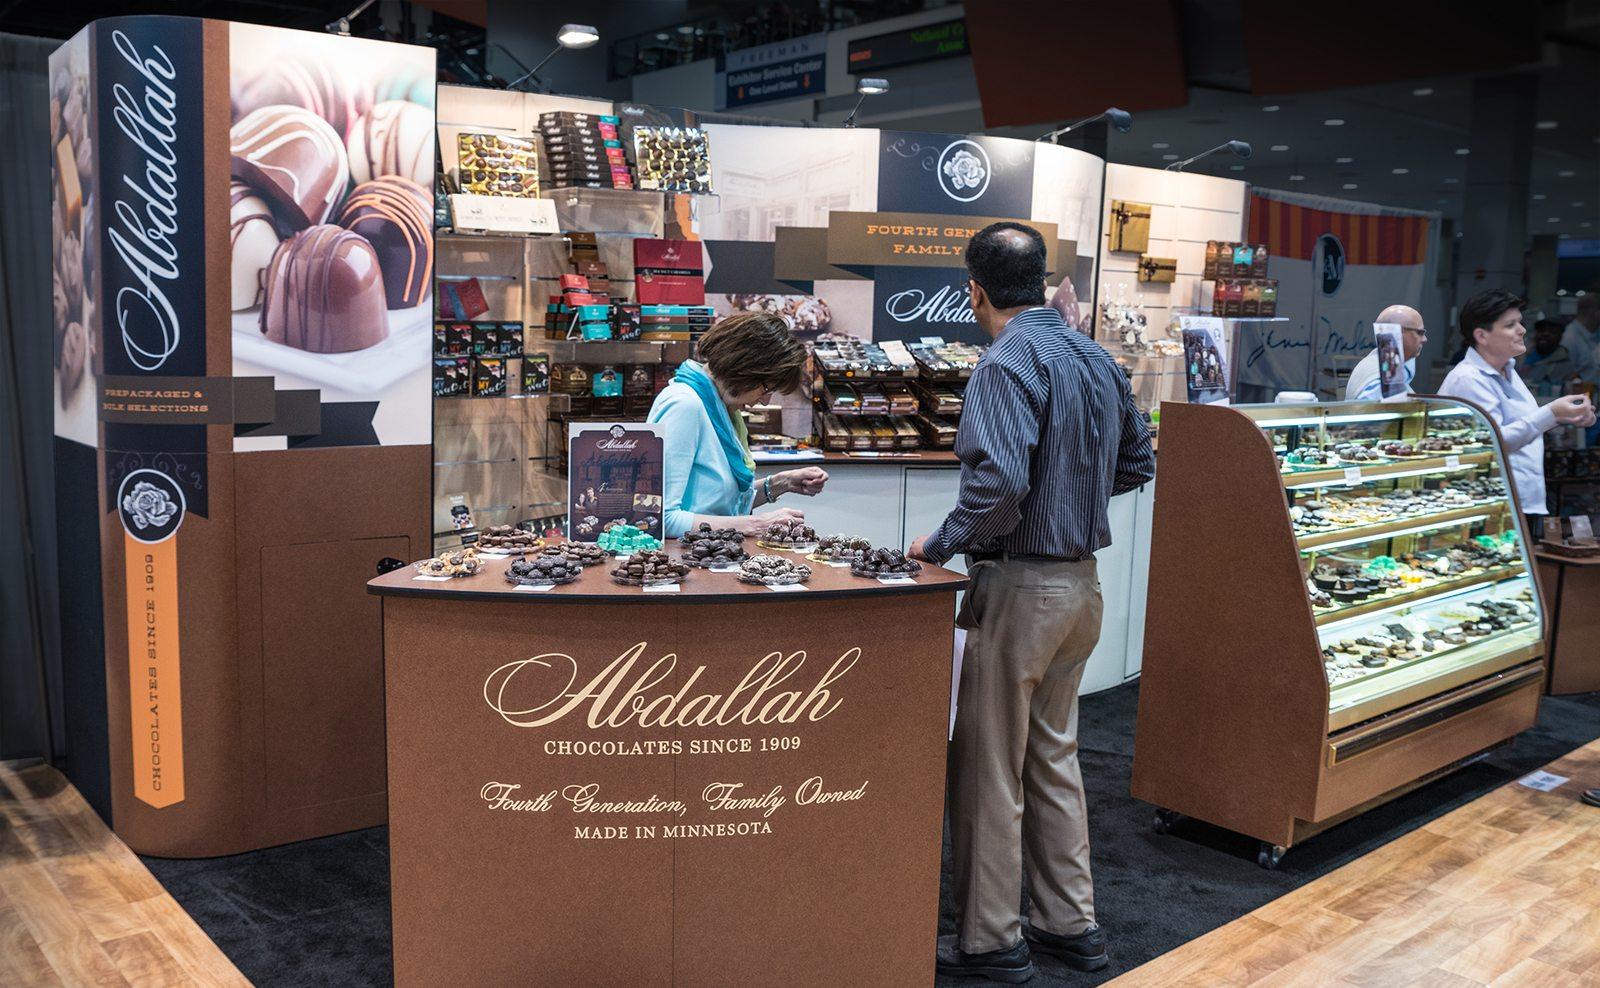 Abdallah_exhibits